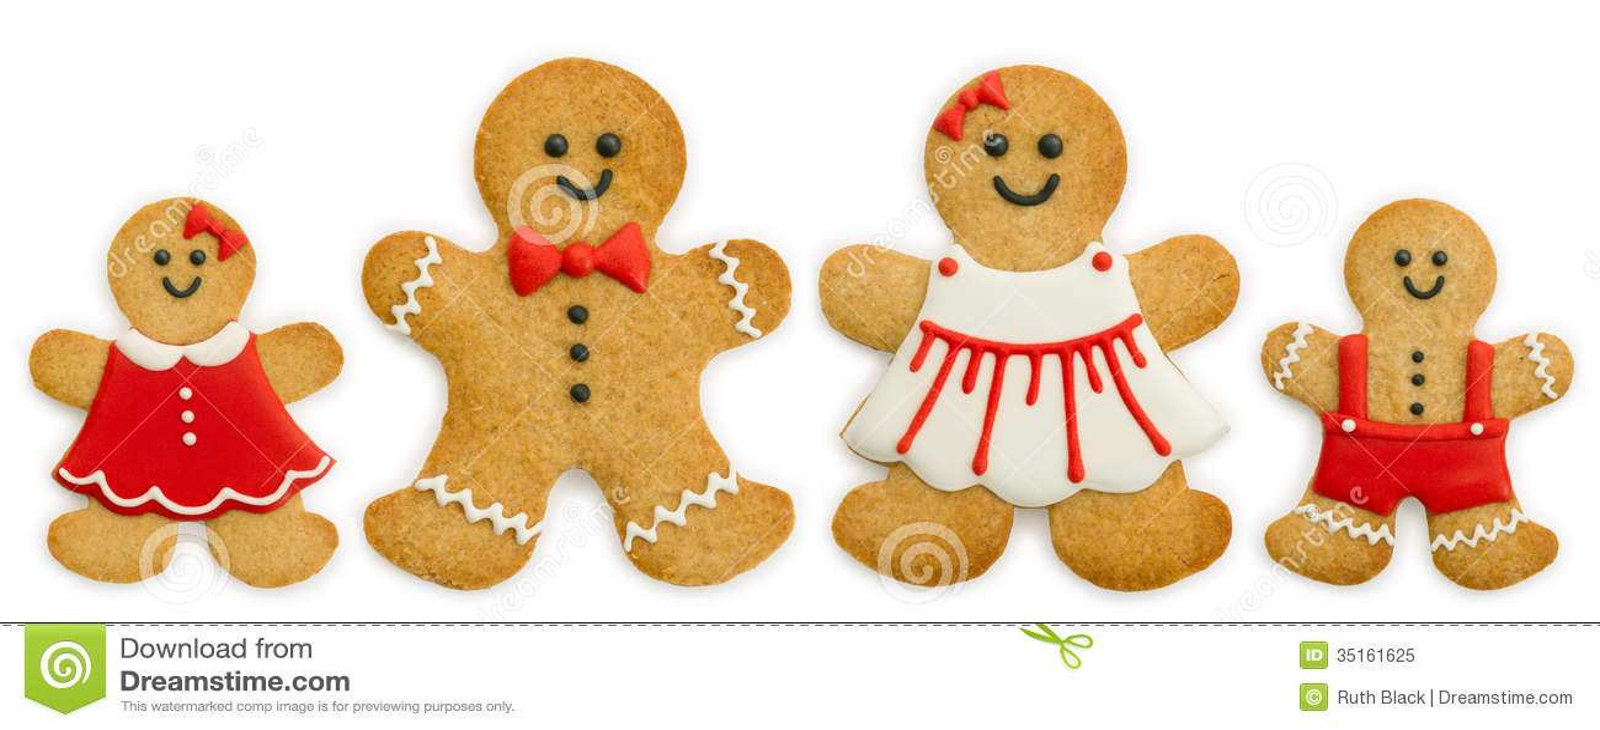 Cookie Decorating Clip Art